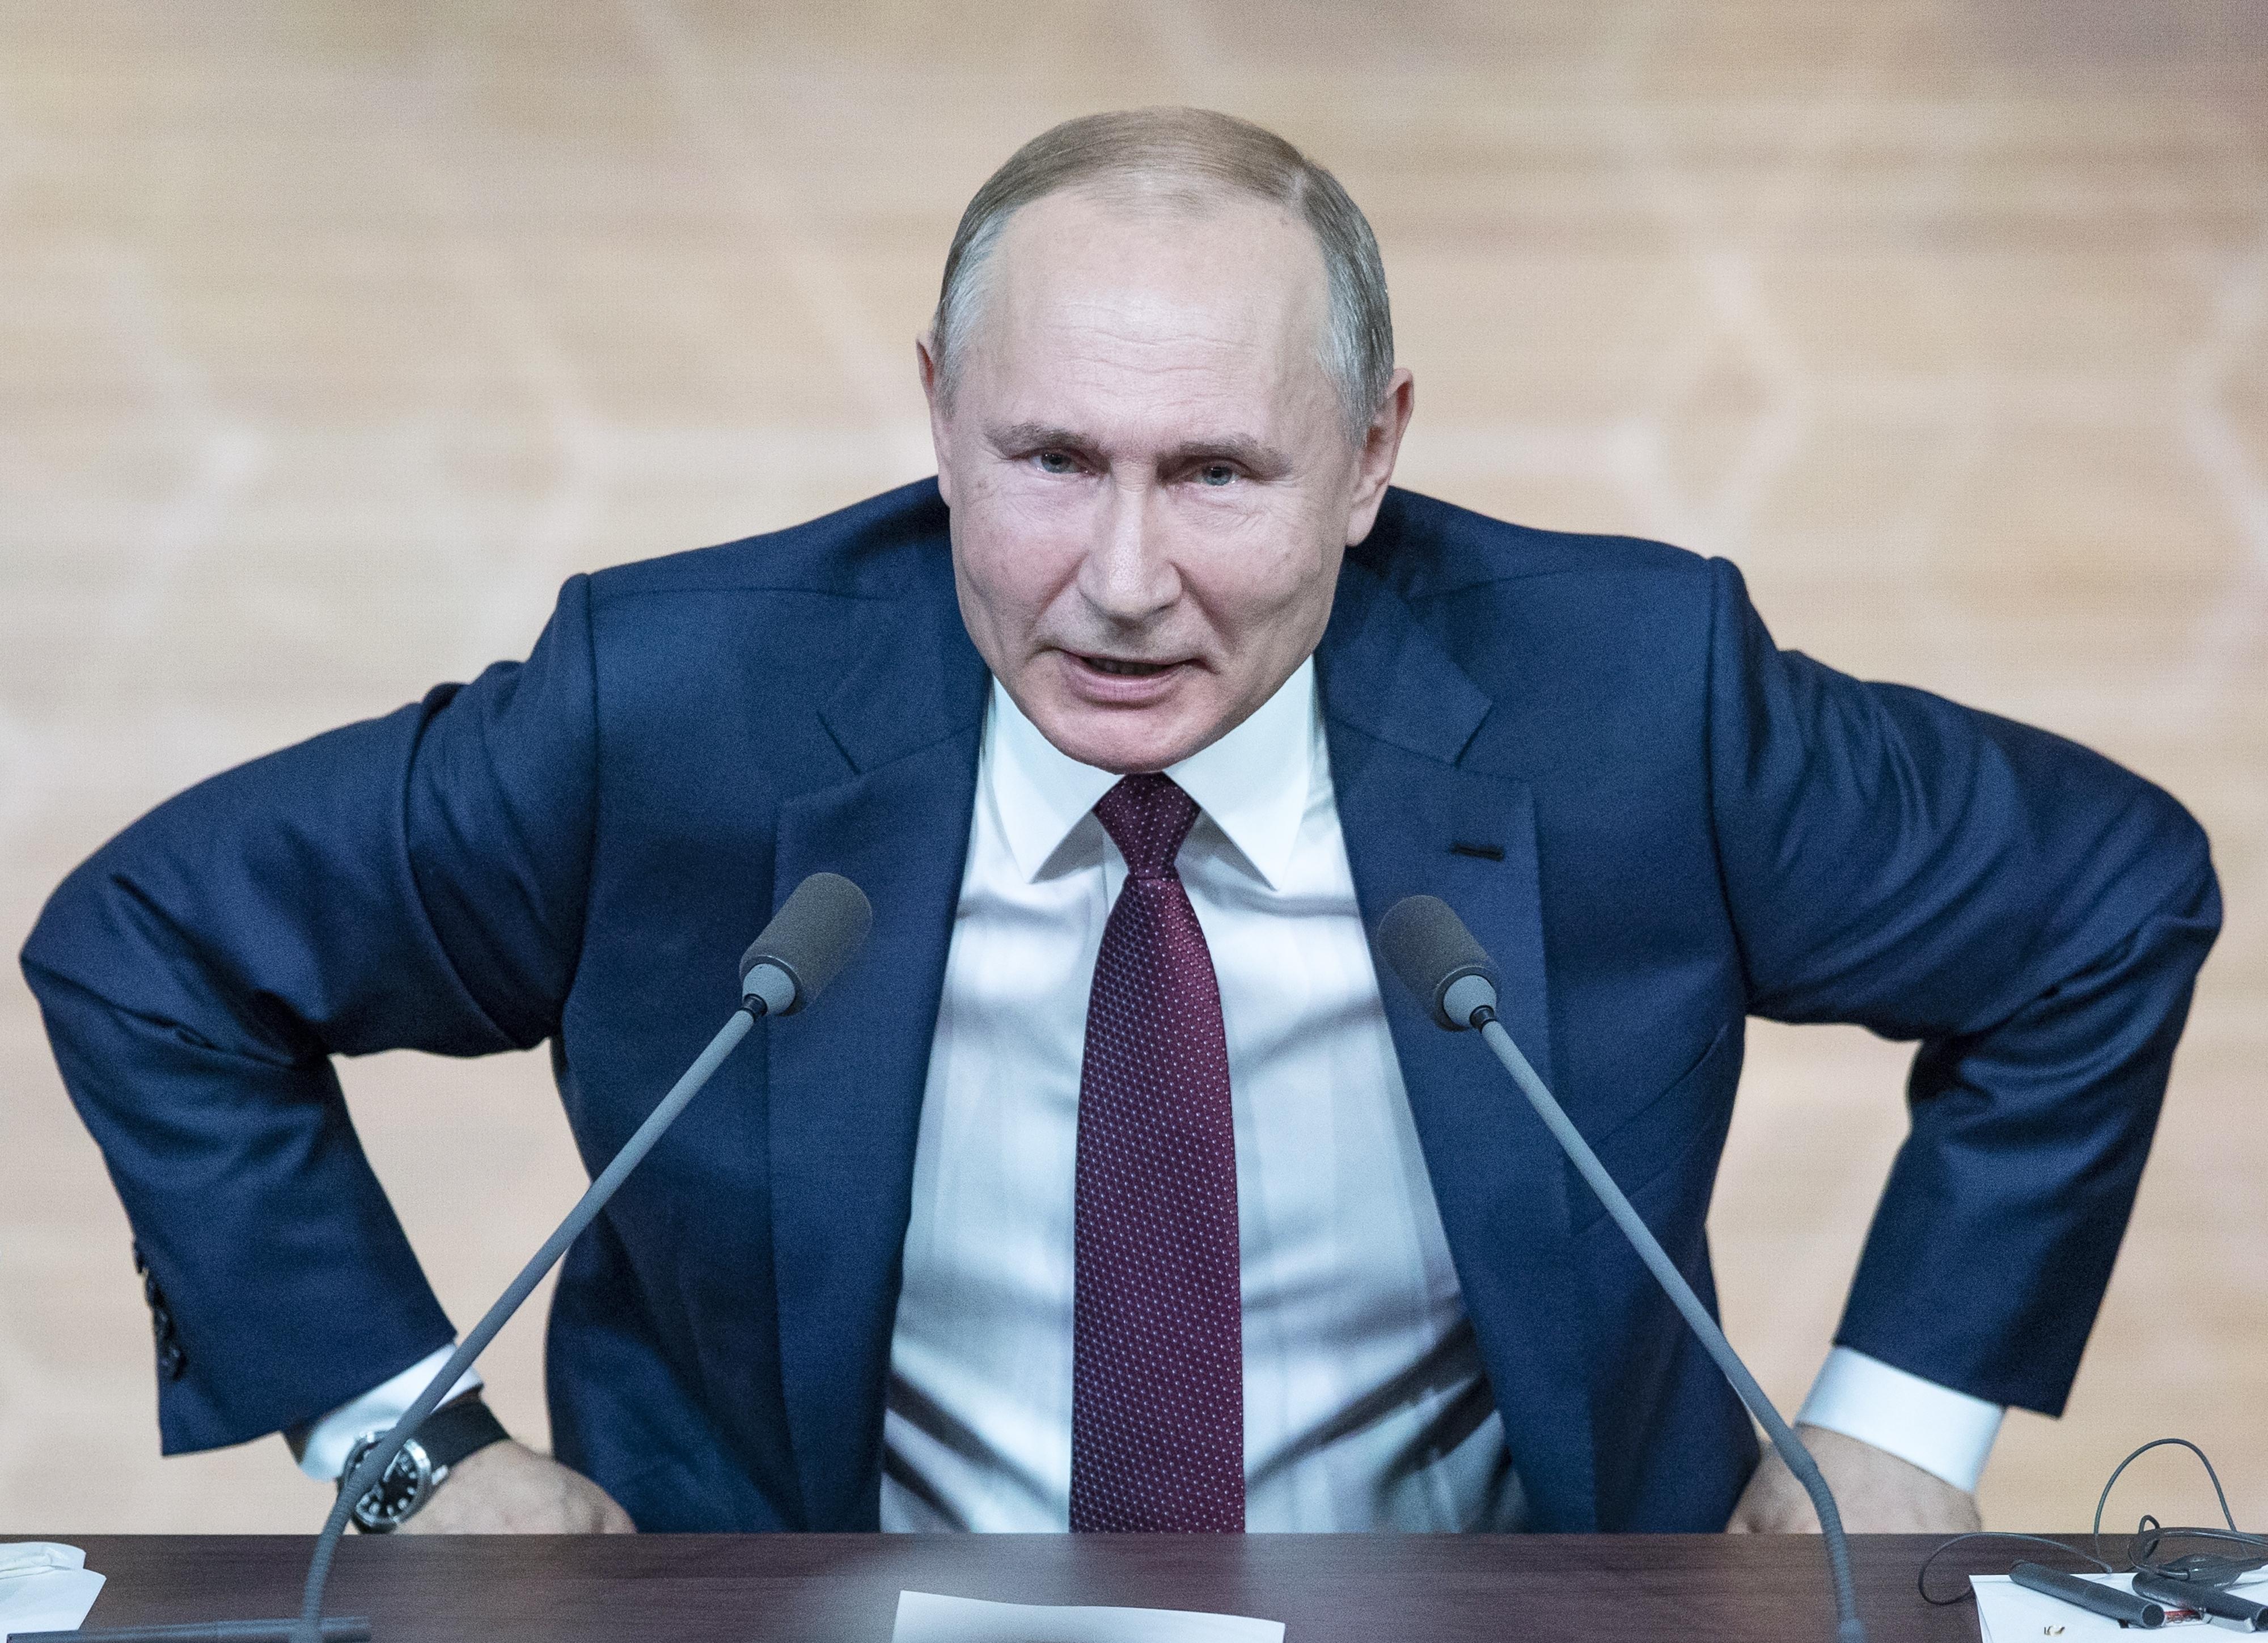 Putin, Ukraines leader talk about natural gas, prisoners